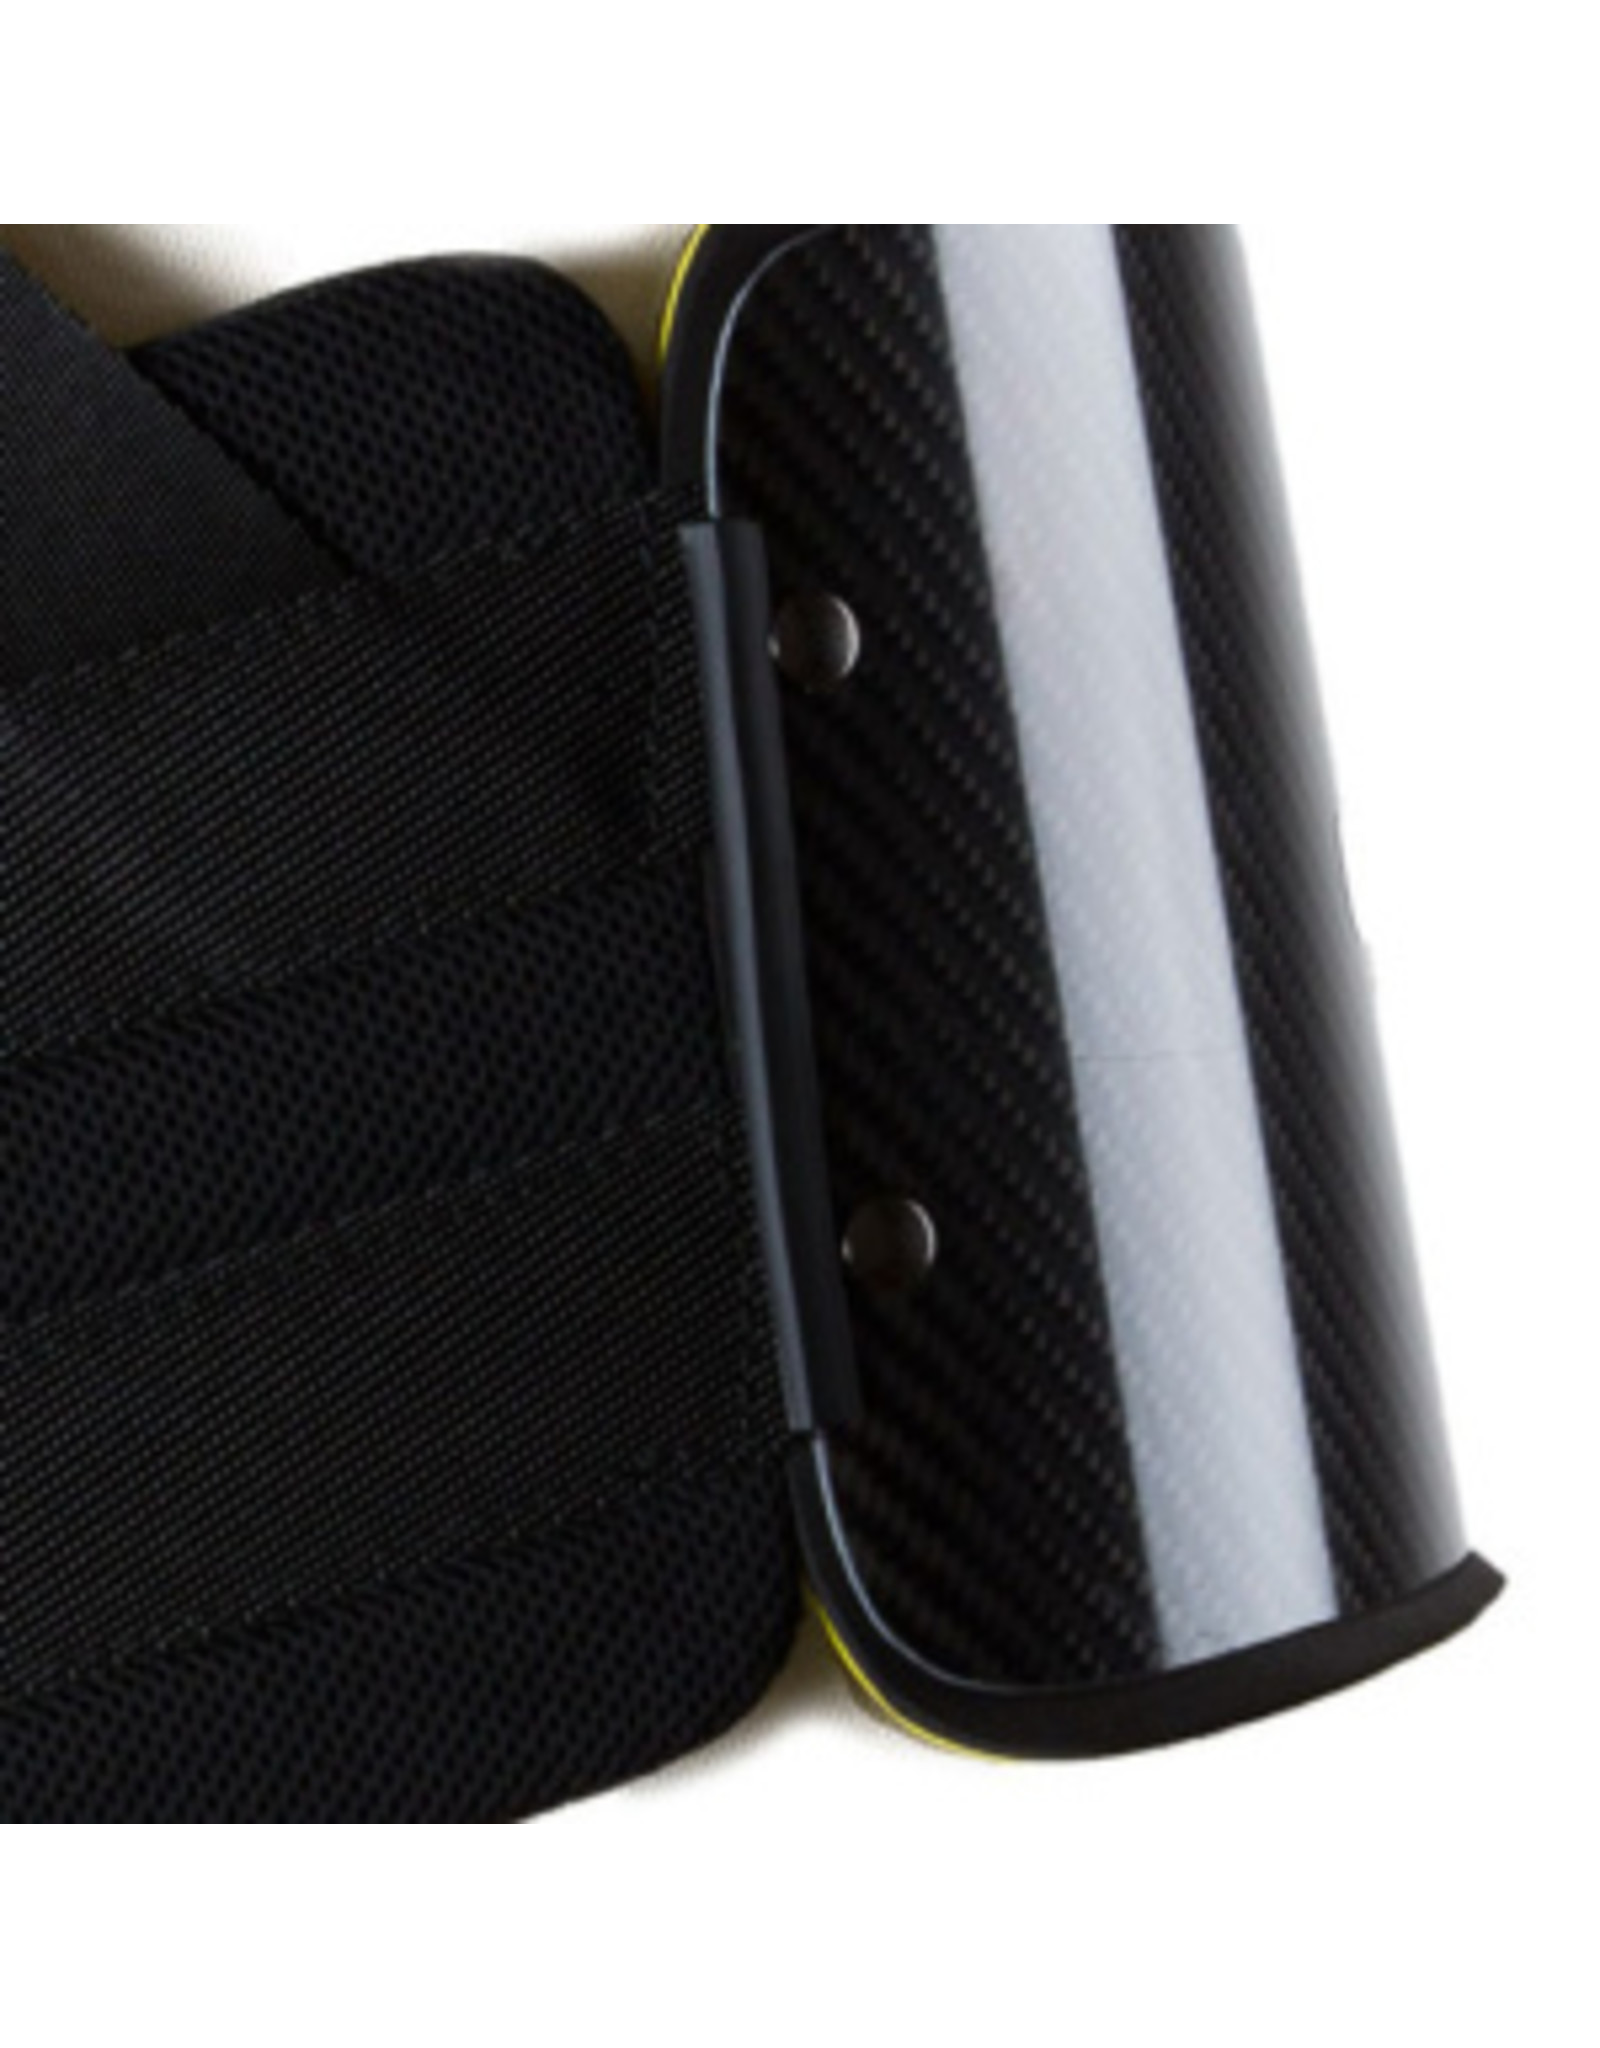 Bengio Bengio bumper rib beschermer carbon